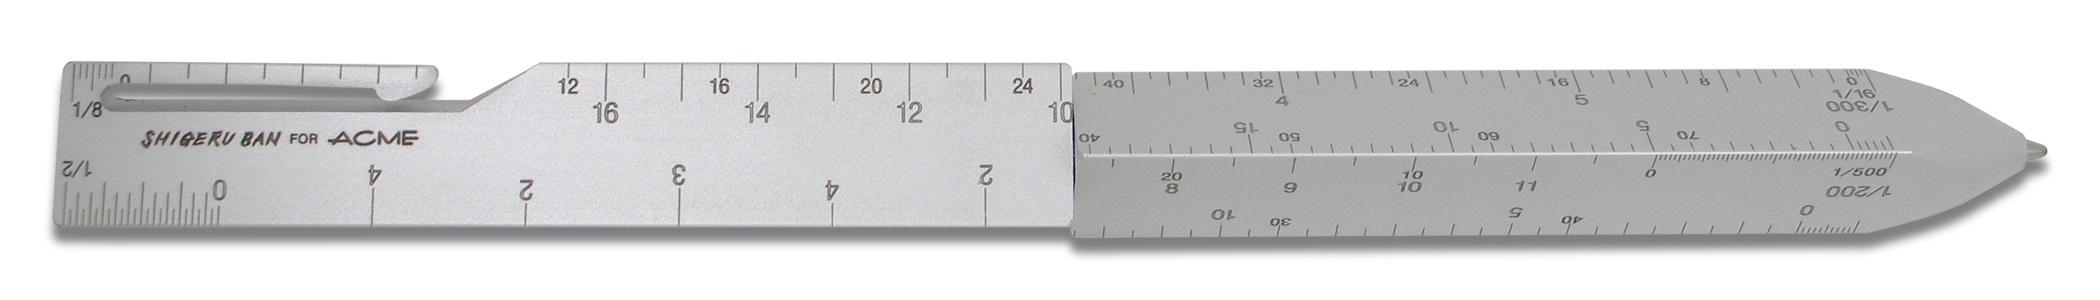 1.P2SB01-Scale_turn